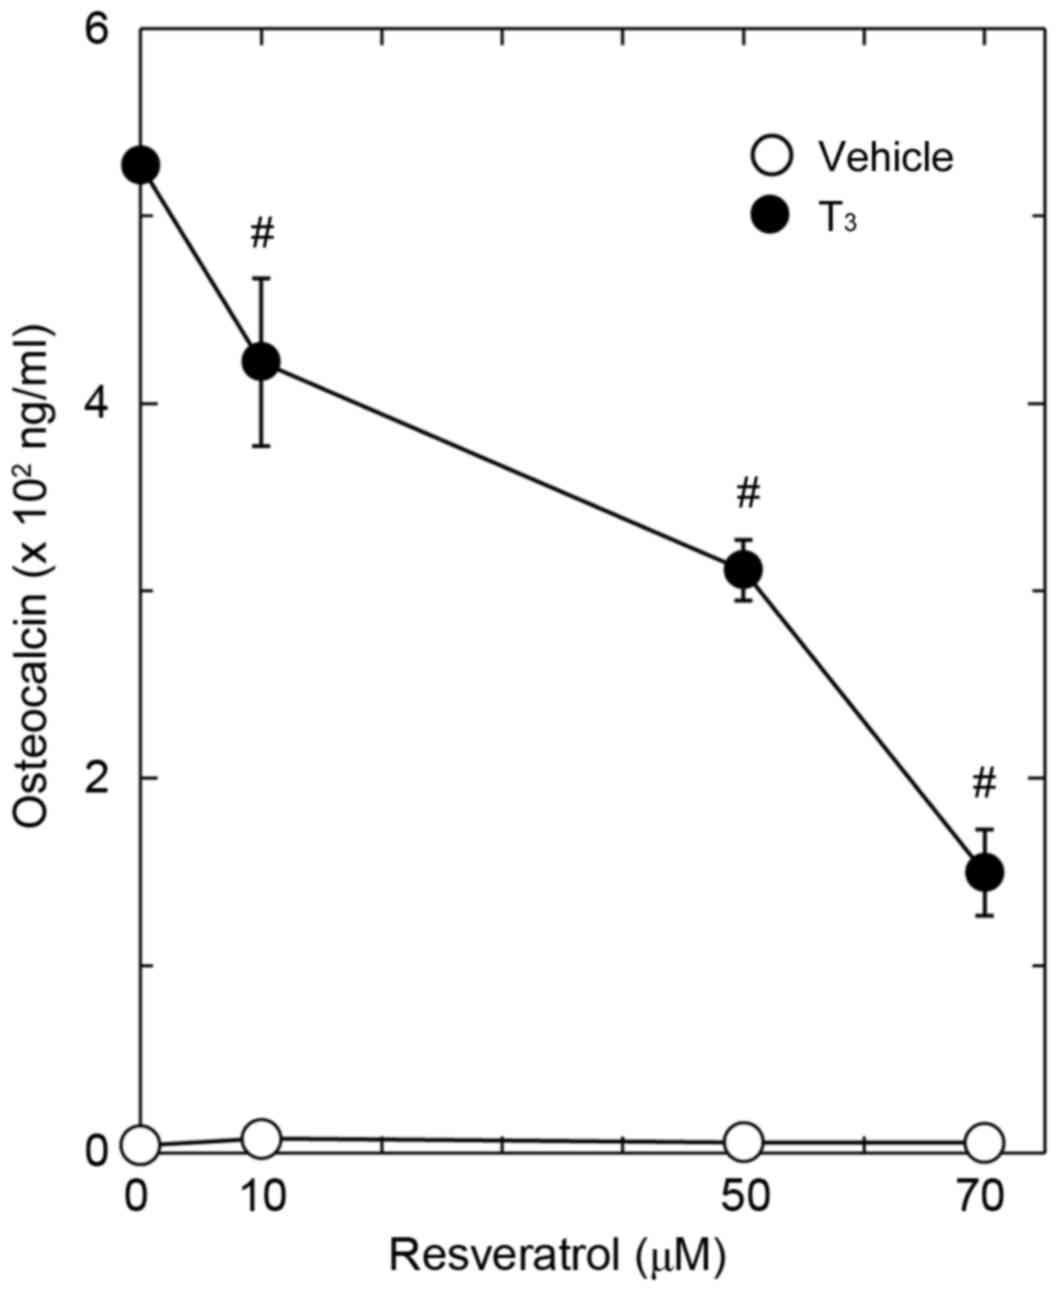 Resveratrol suppresses thyroid hormone‑induced osteocalcin